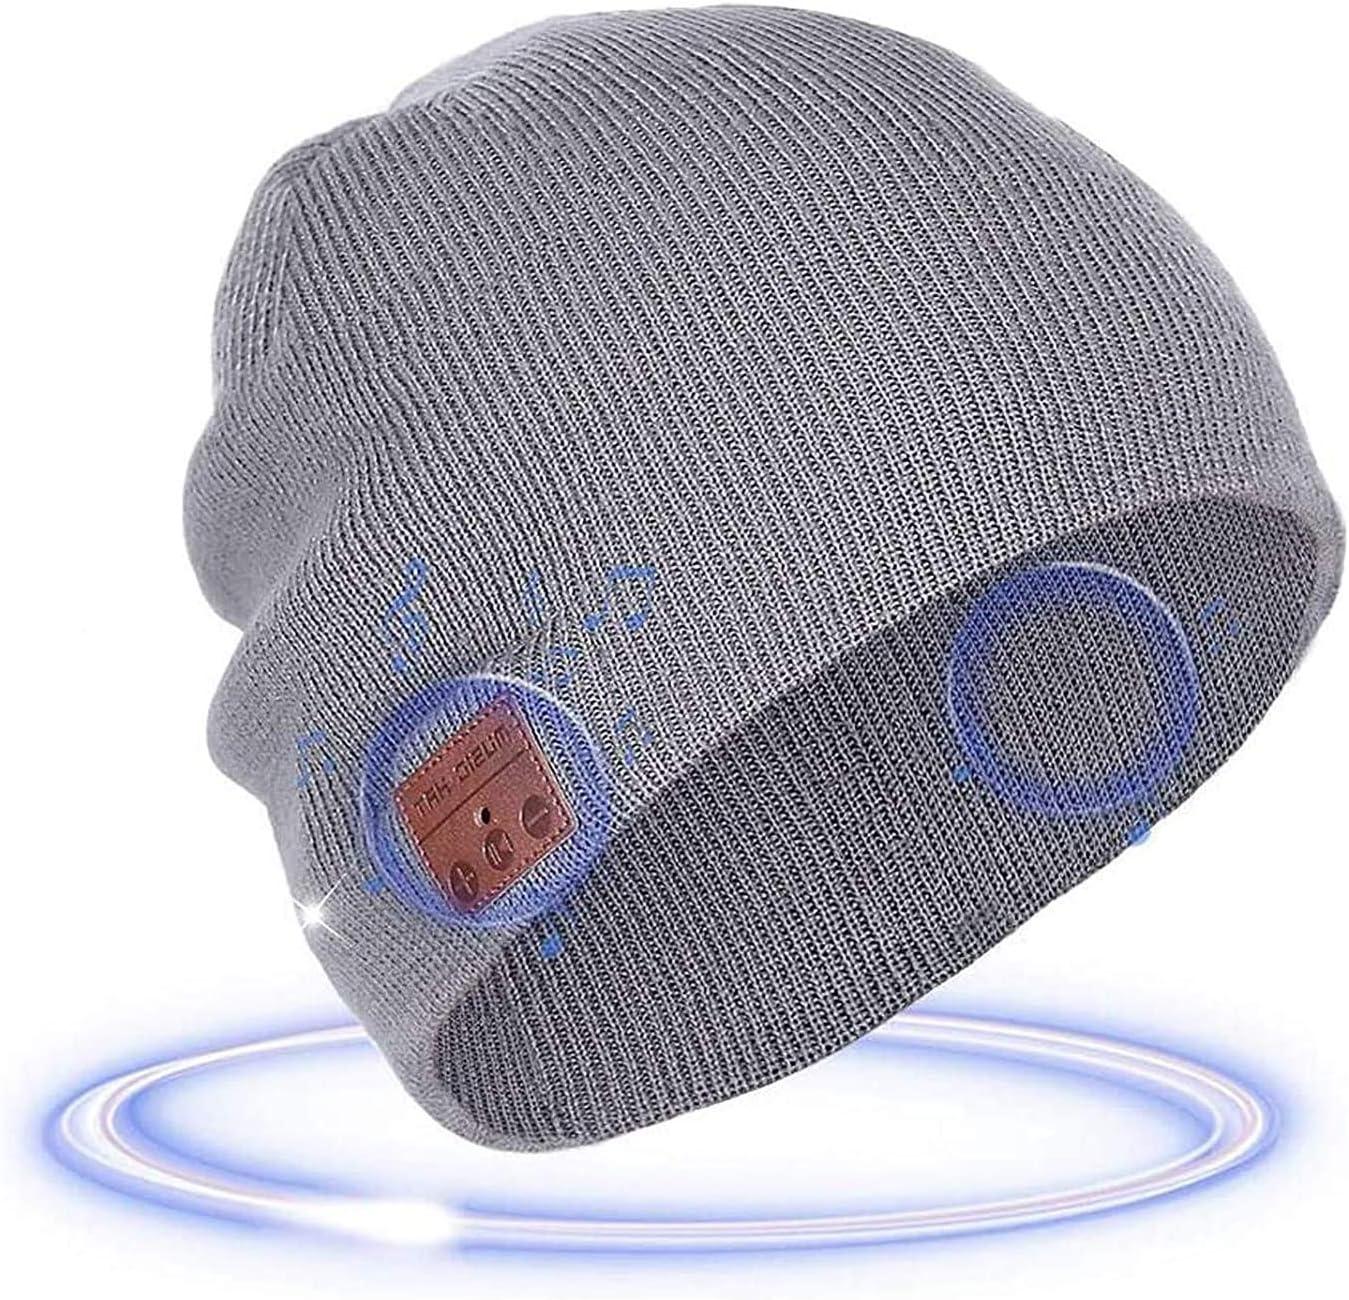 ONX3 Dark Grey Wireless Beanie Hats Cap Smart Winter Knit Hat V4.1 Musical Headphones Earphones w// 2 Speakers Unisex Unique Christmas Tech Gifts Compatible With Xiaomi Pocophone F1